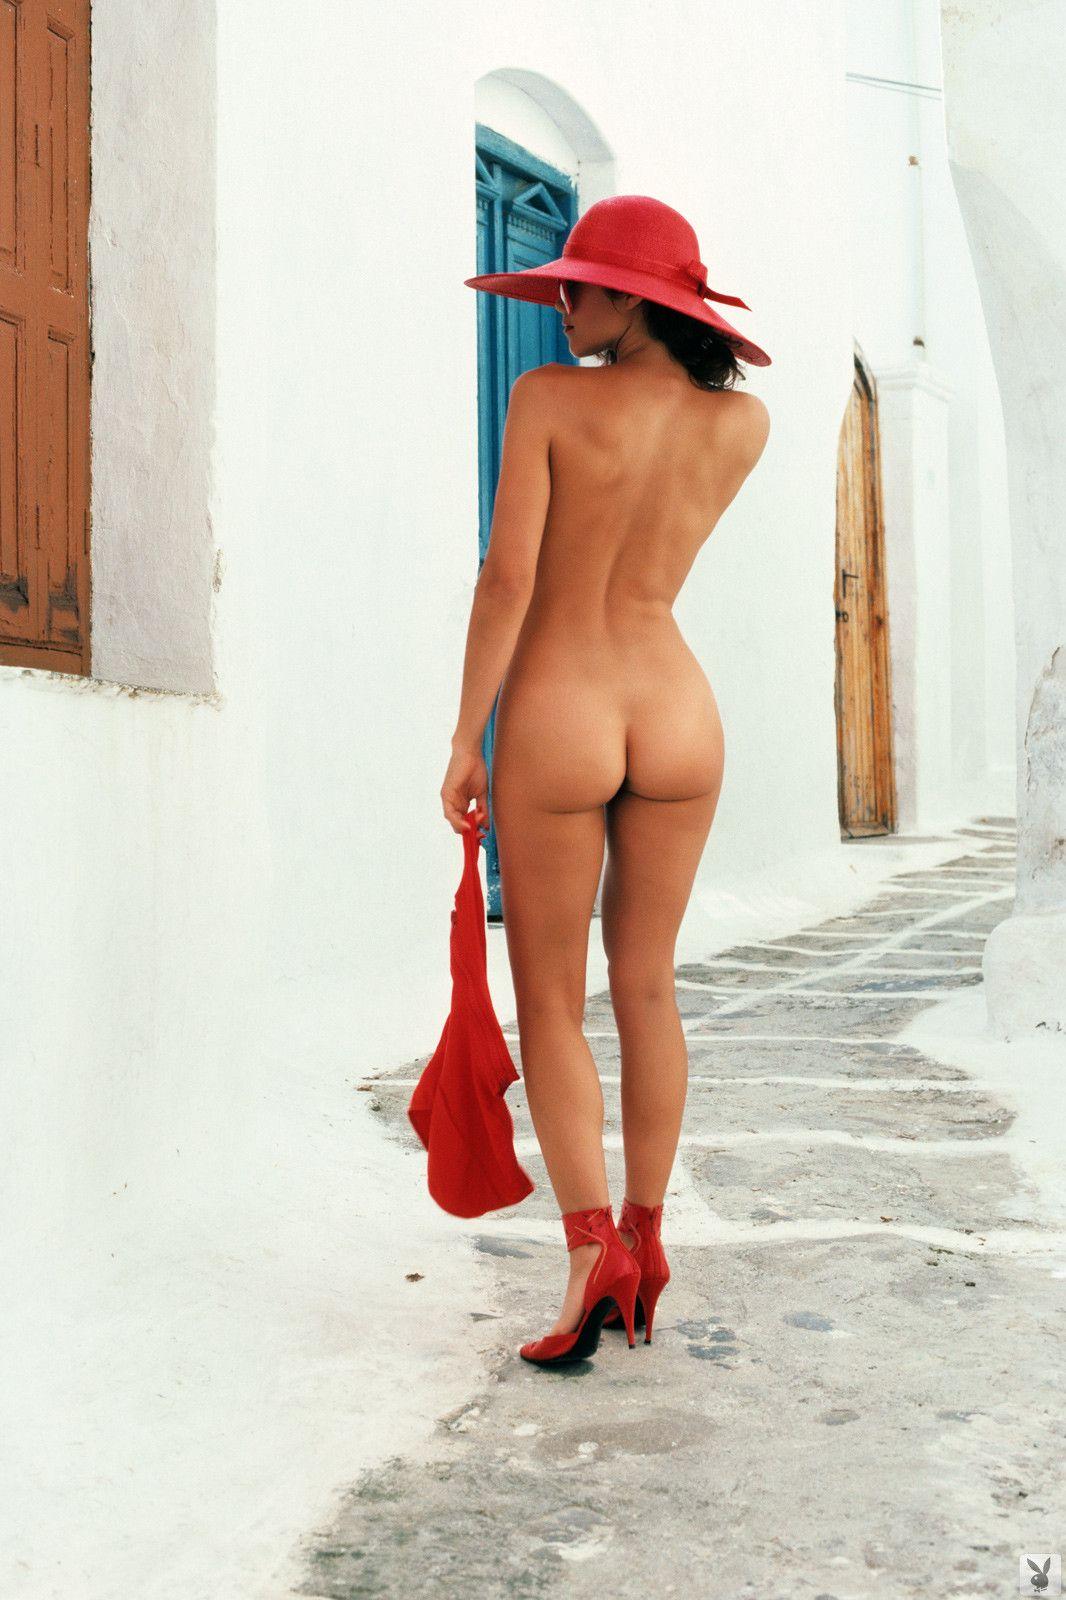 Barbi benton nudes